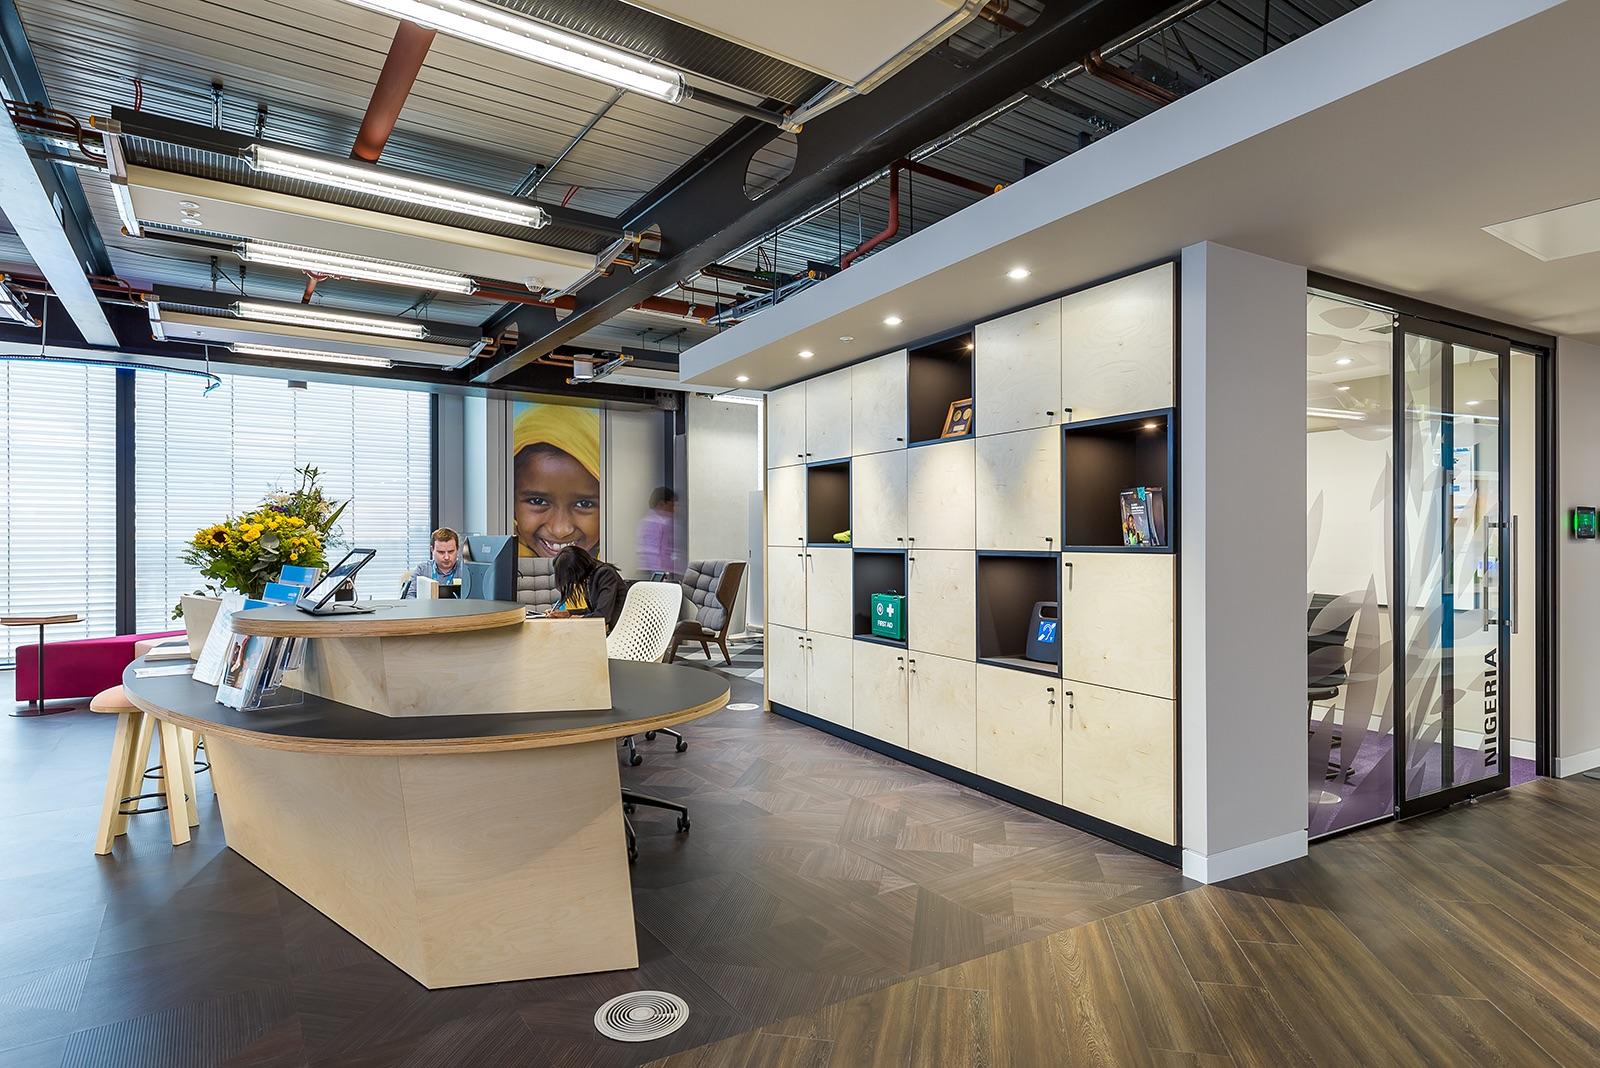 unicef-london-office-4